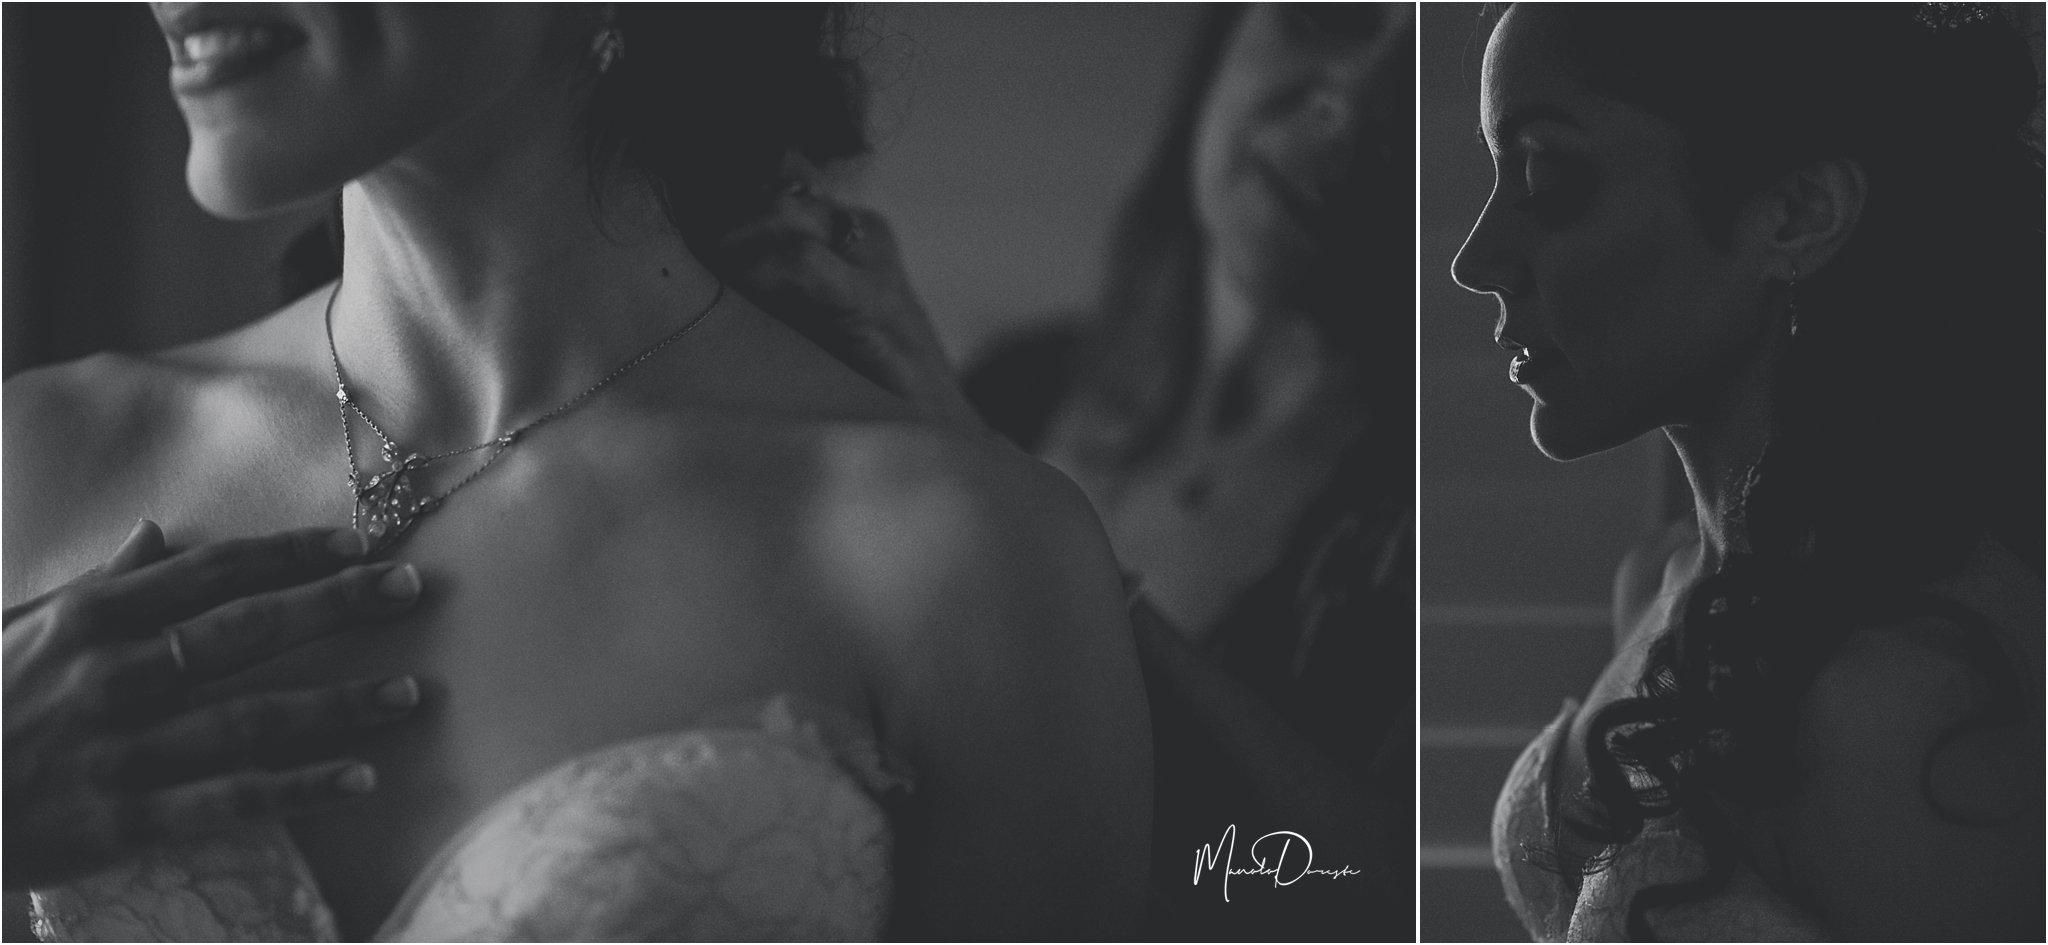 0499_ManoloDoreste_InFocusStudios_Wedding_Family_Photography_Miami_MiamiPhotographer.jpg